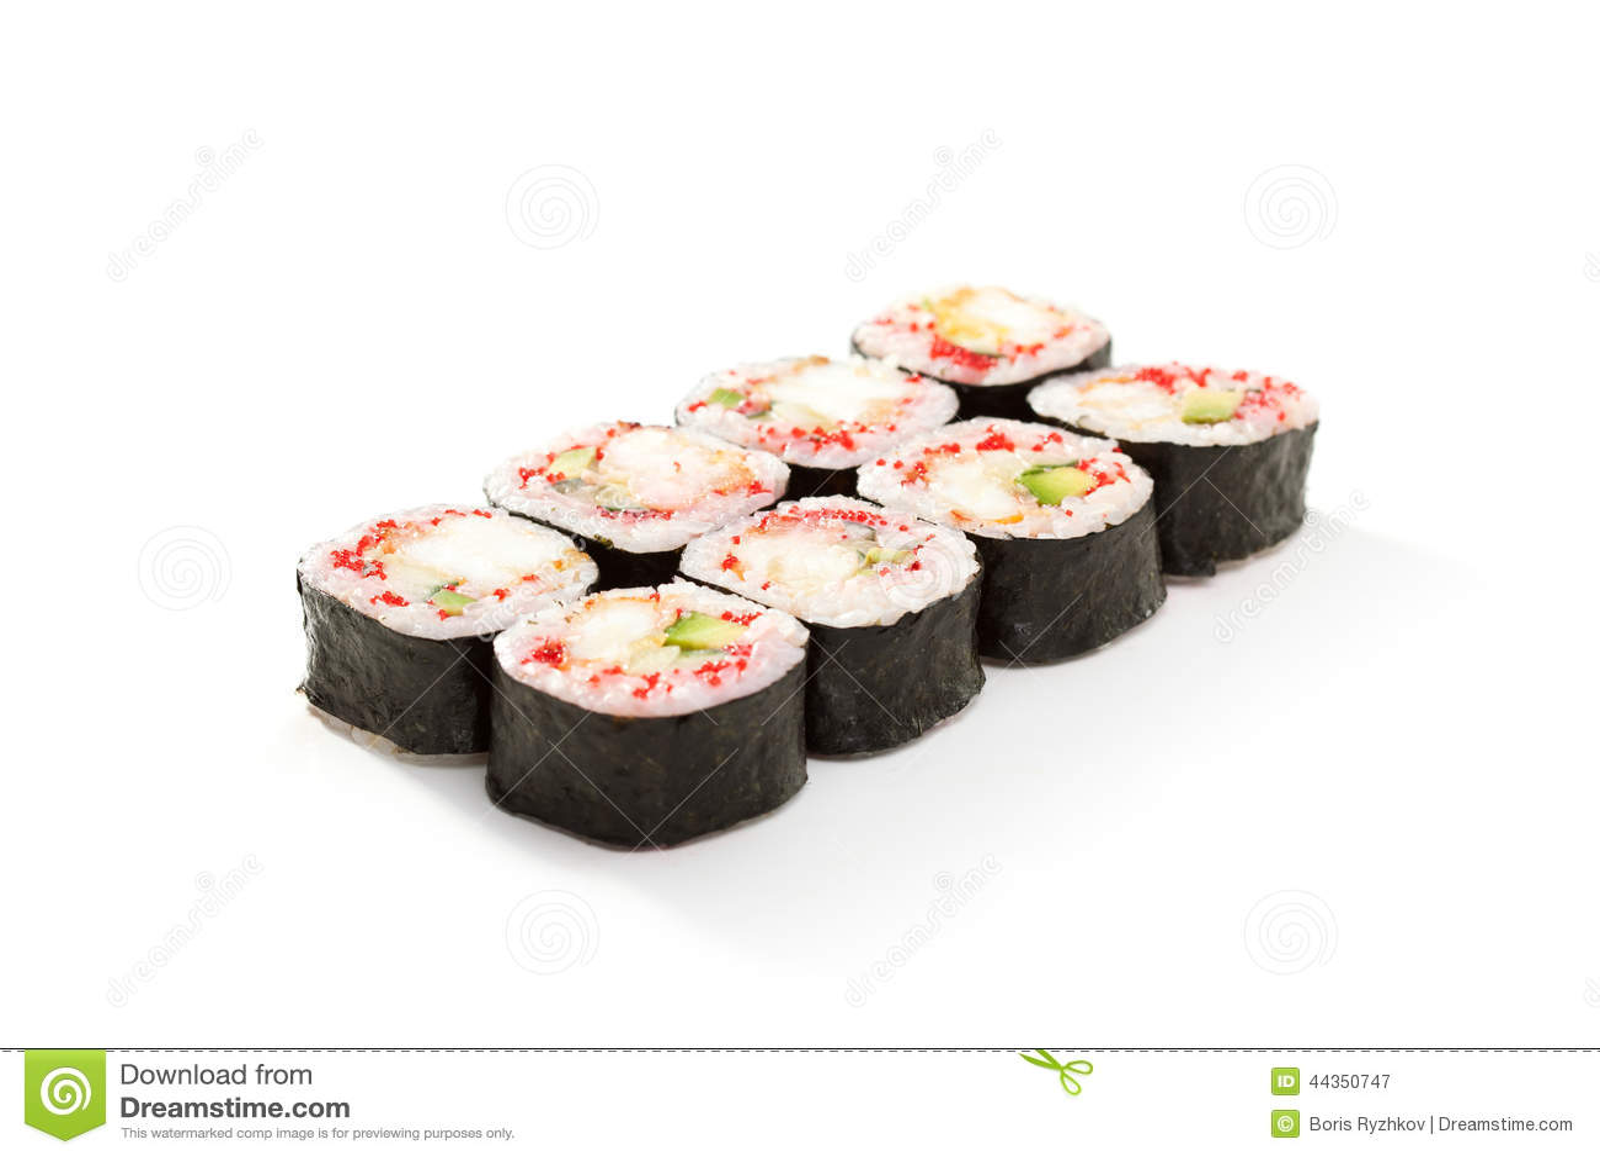 Cucina giapponese - sushi